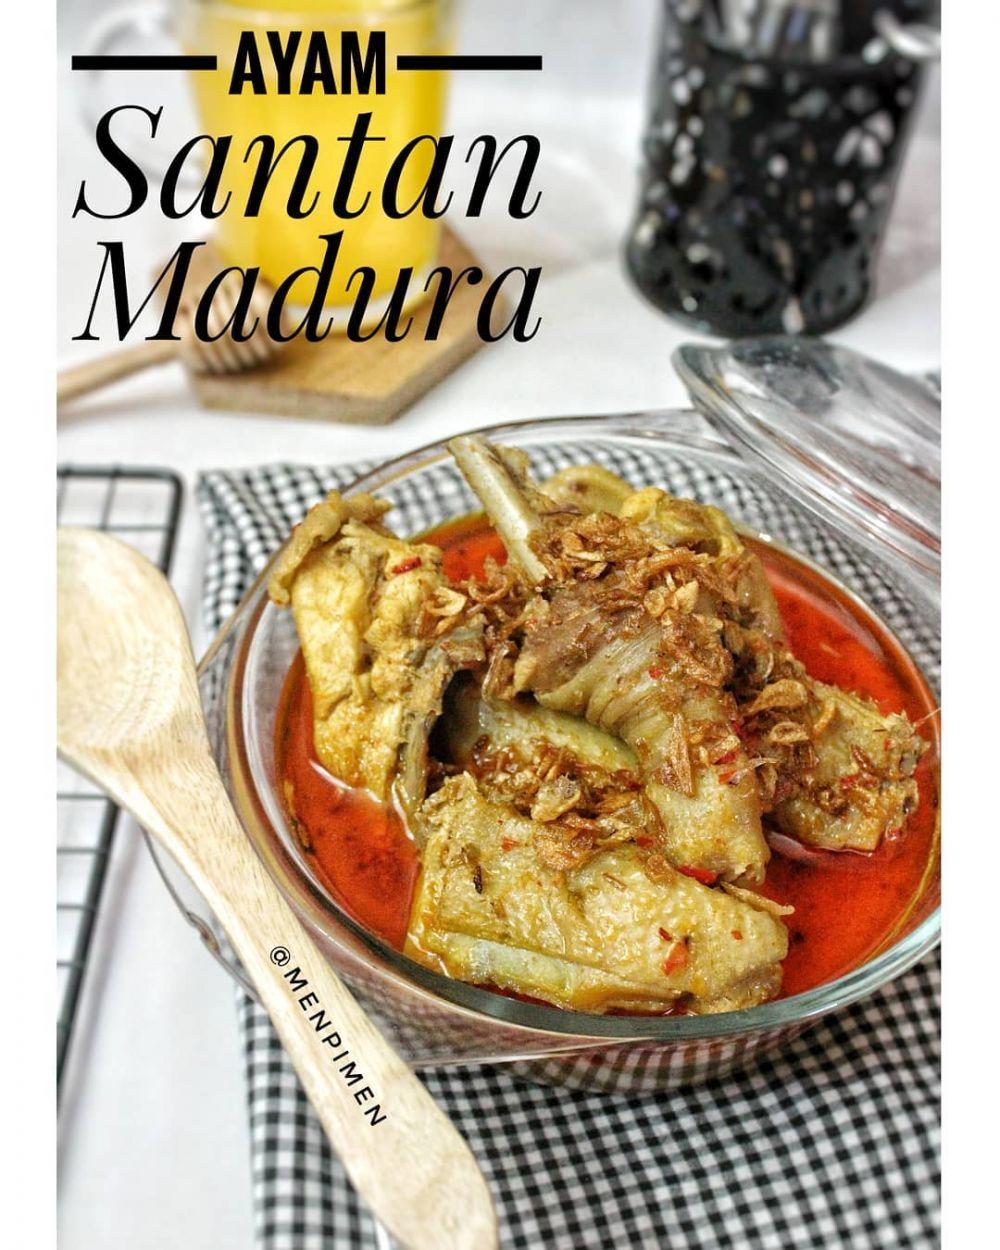 resep ayam santan © 2020 brilio.net/ Instagram